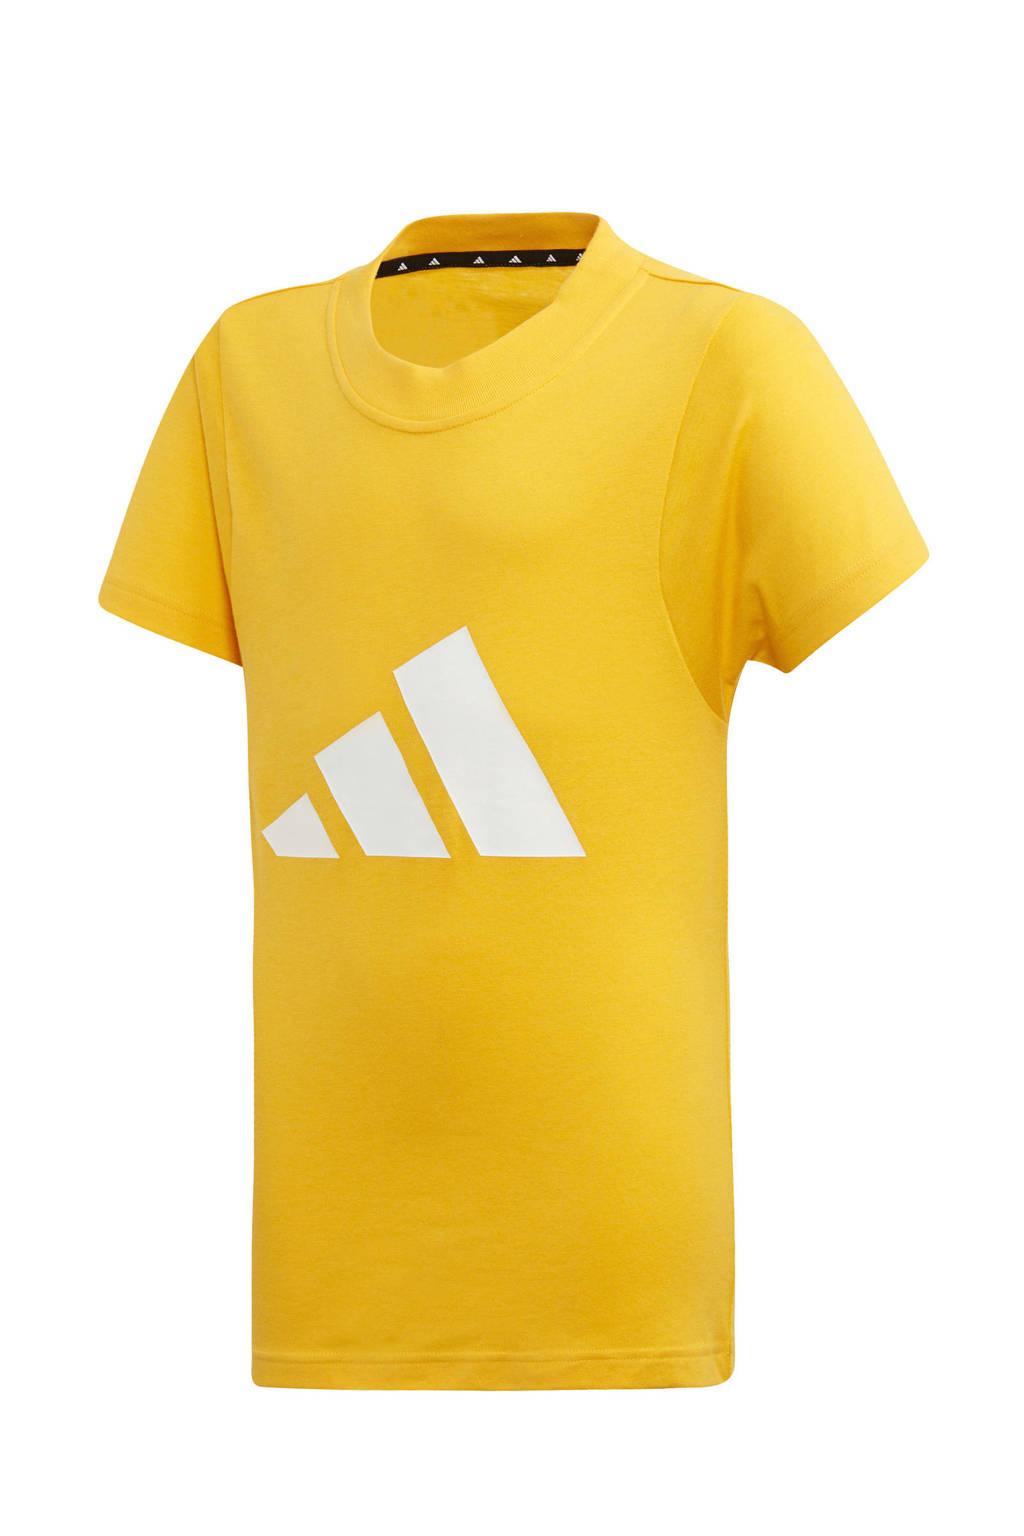 adidas sport T-shirt geel, Geel/wit/rood